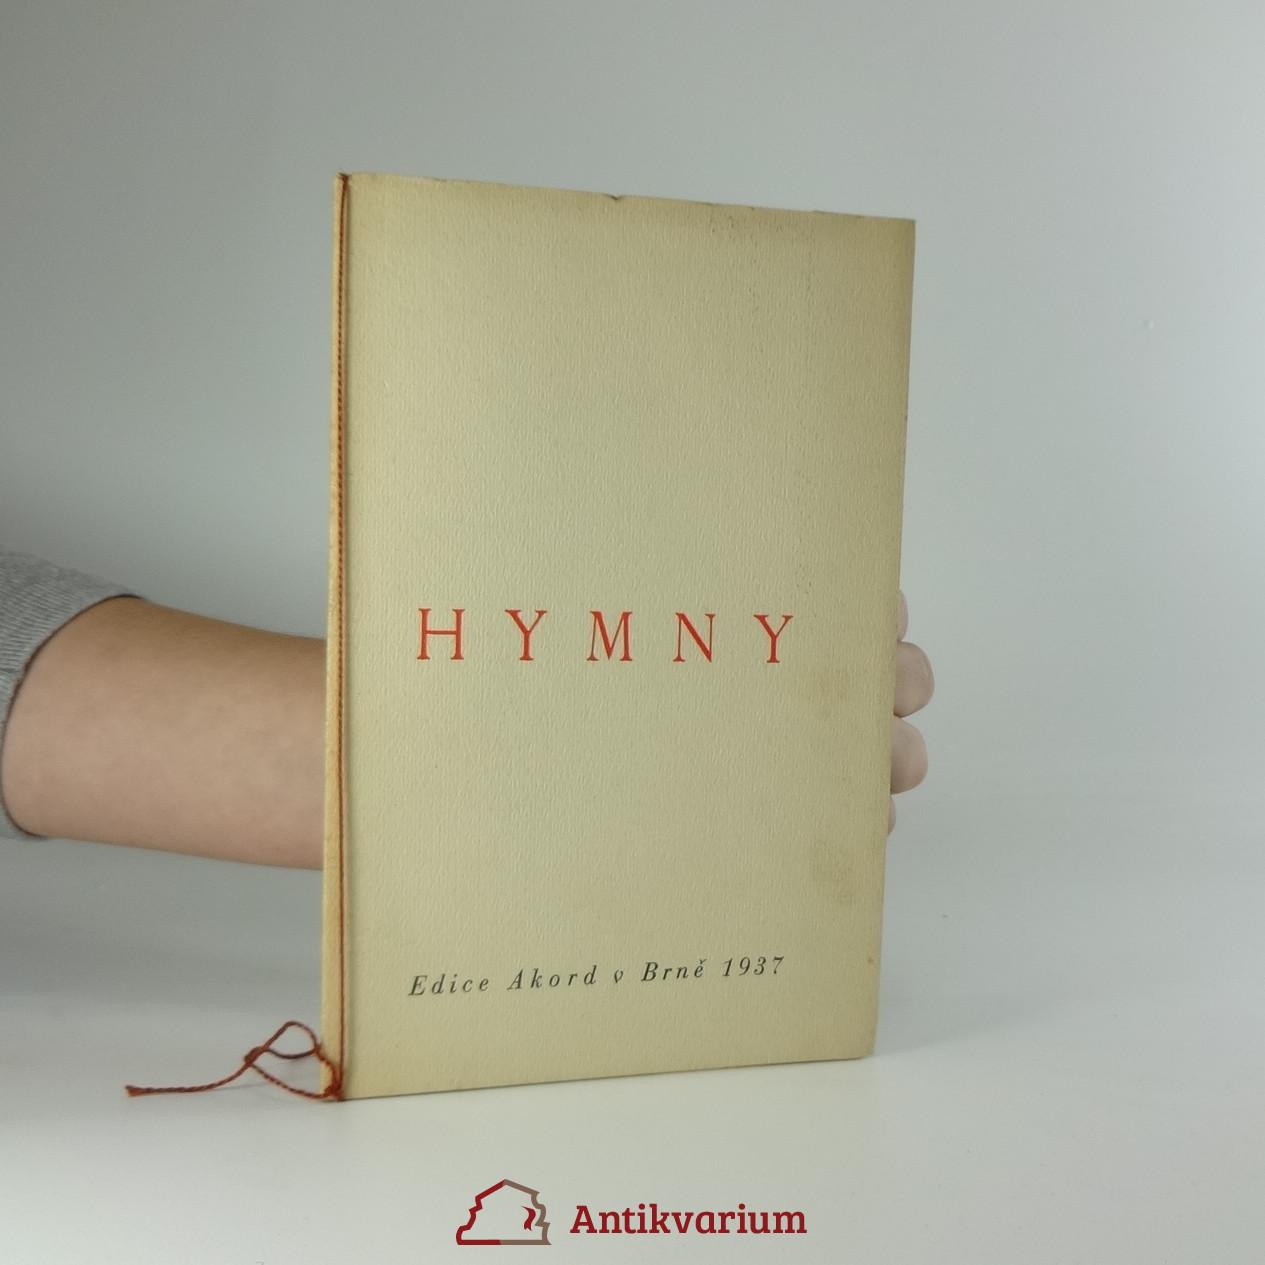 antikvární kniha Hymny, 1937